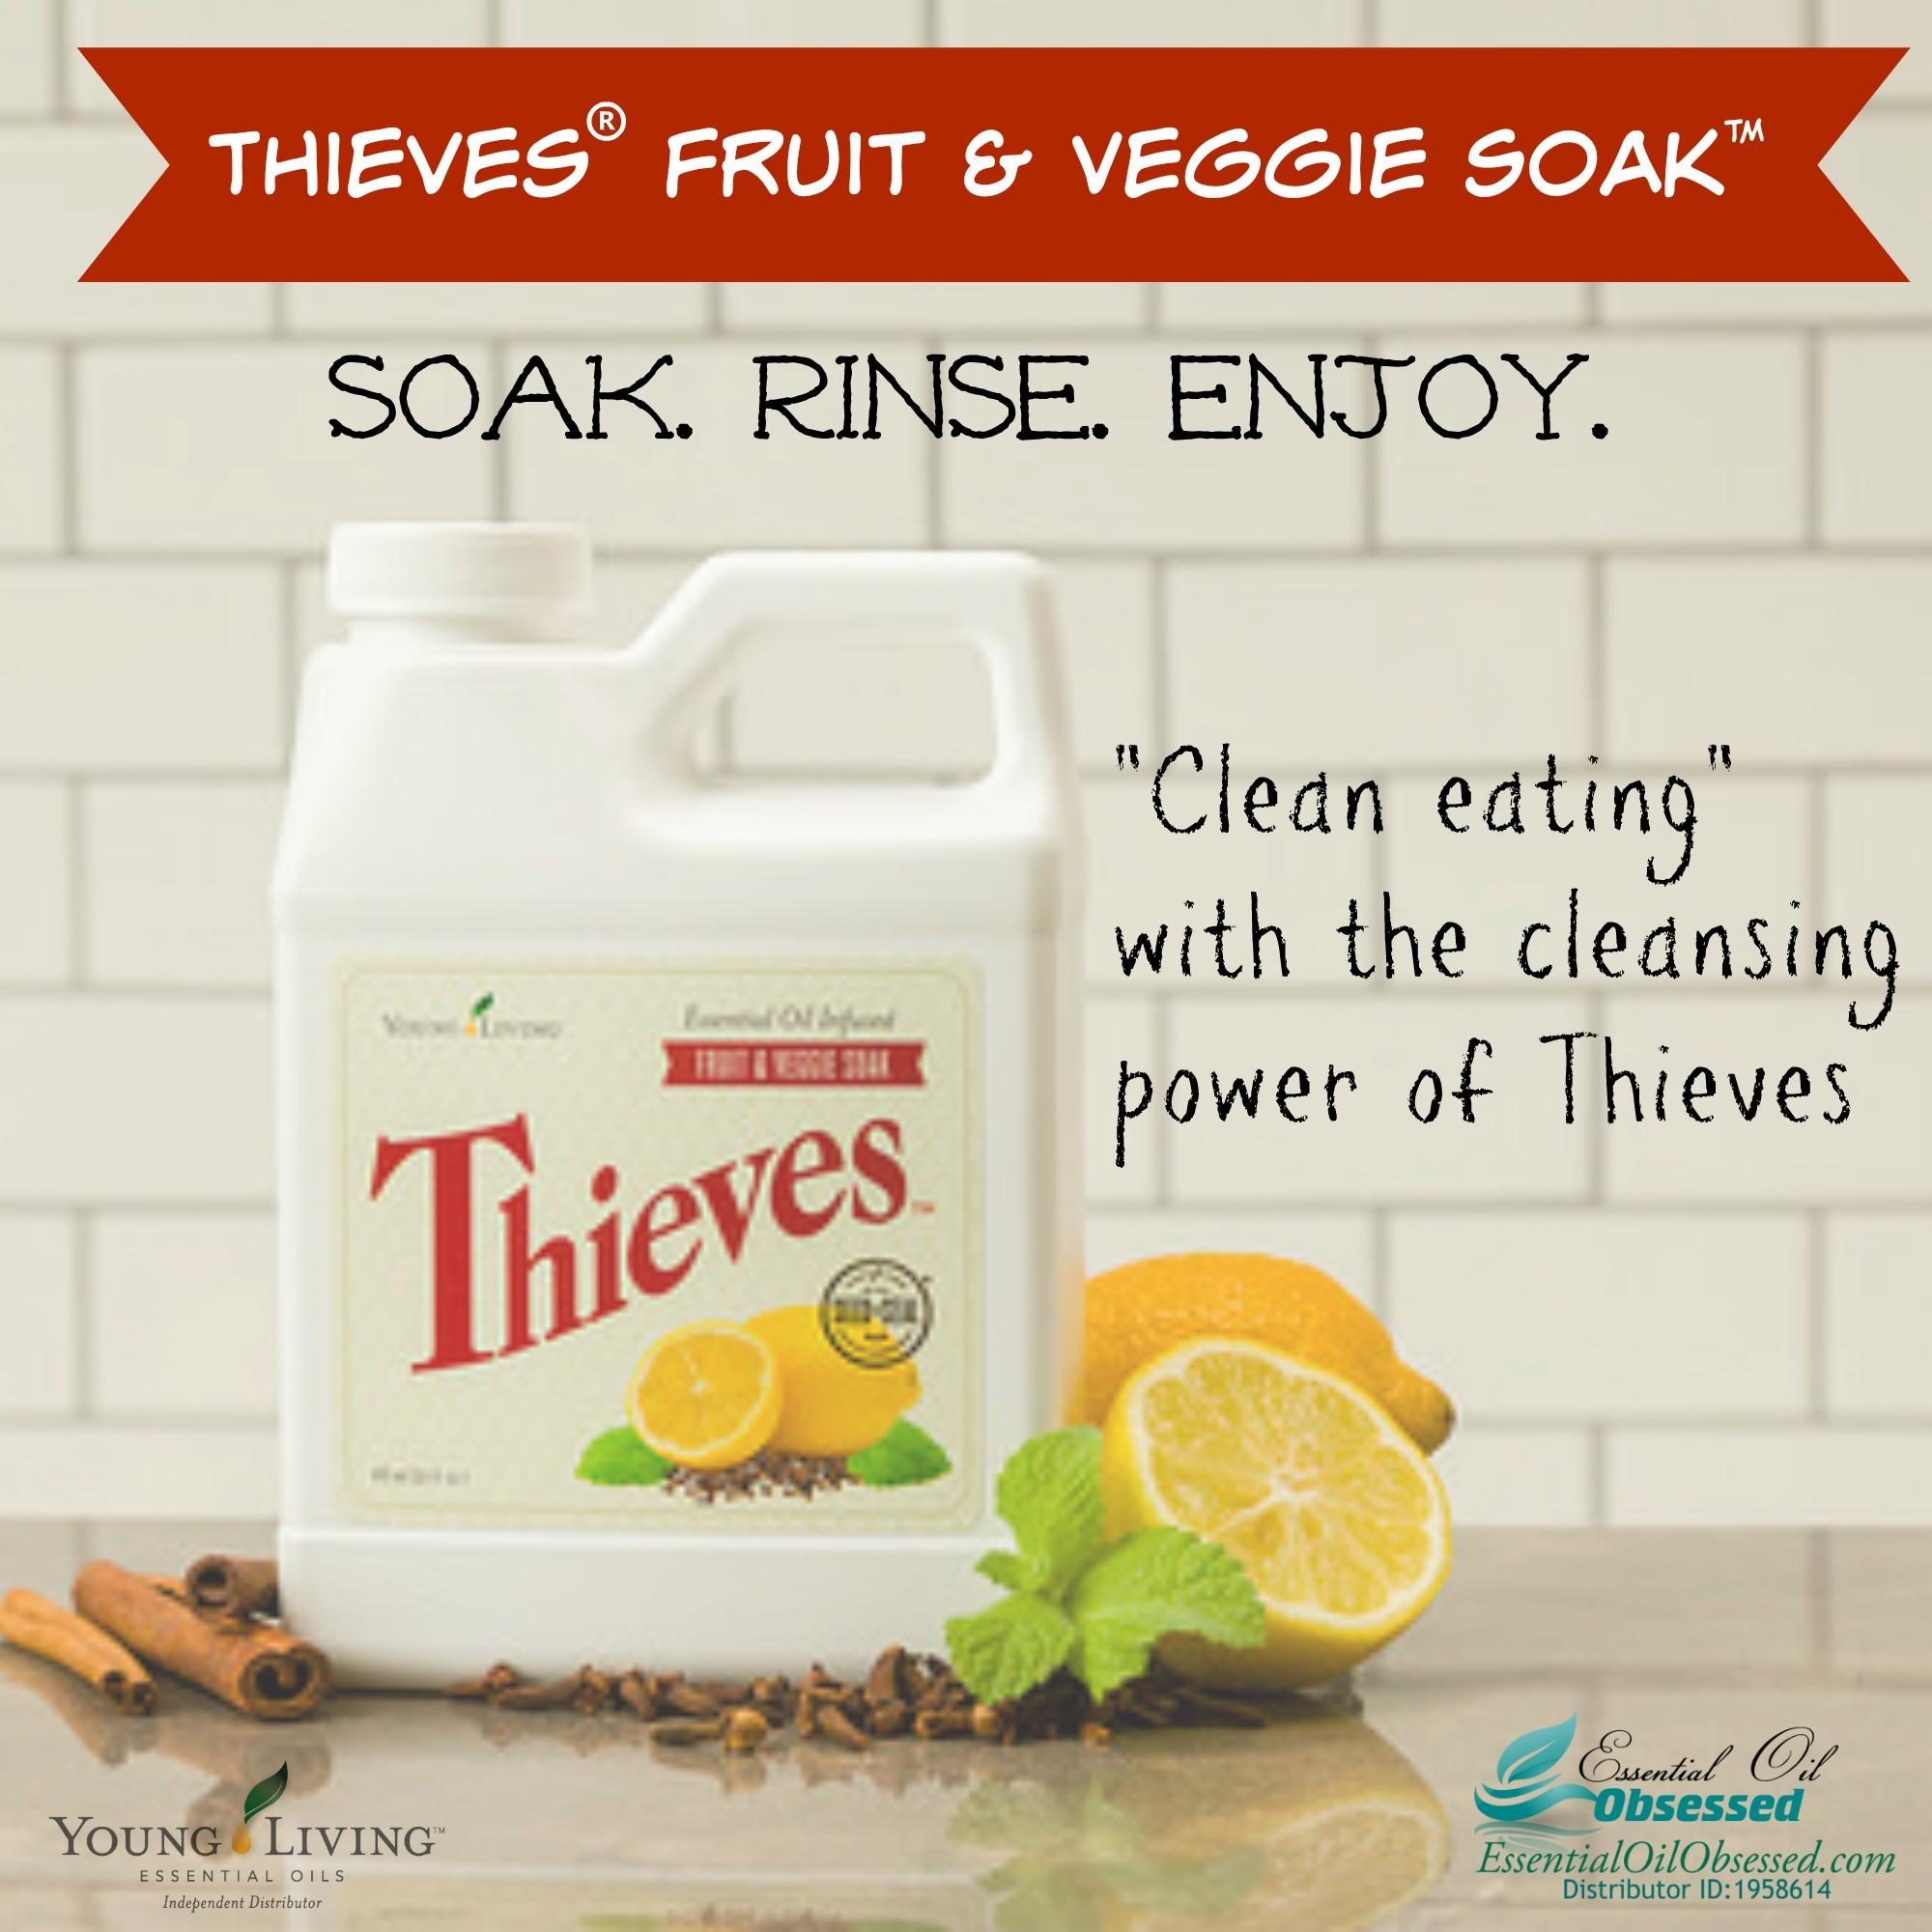 Thieves 174 Fruit Amp Veggie Spray And Soak Essential Oil